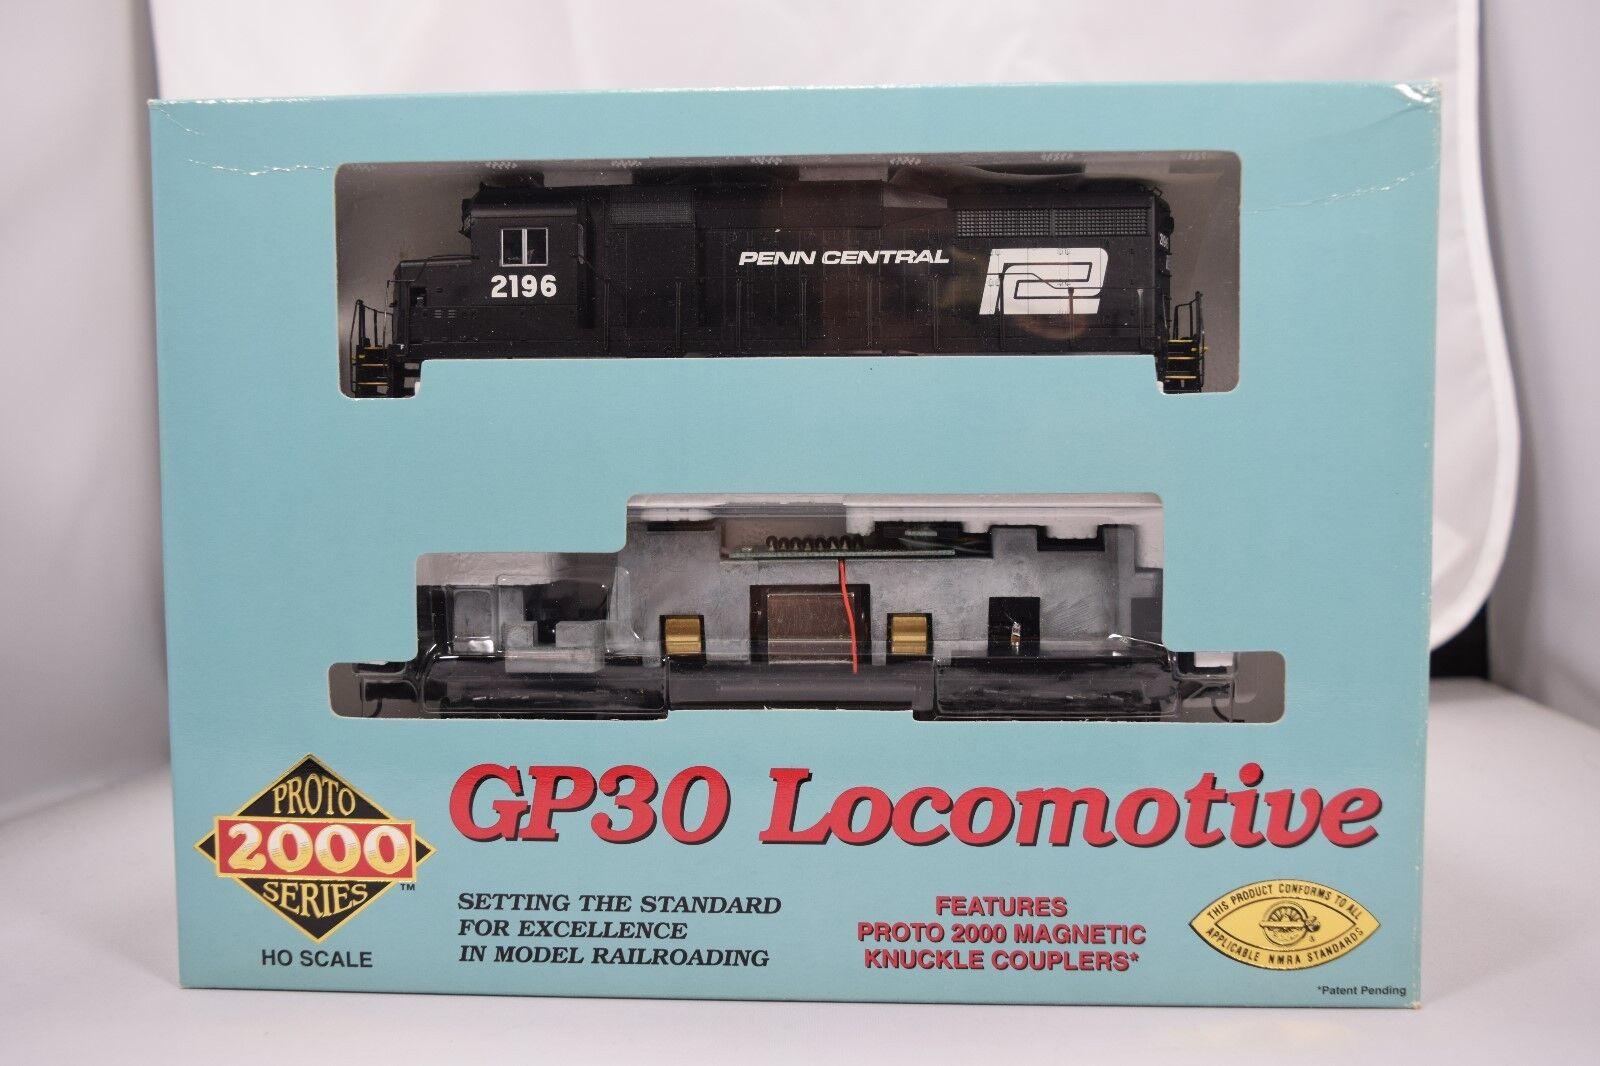 Life-like lokomotive proto - 2000 gp-30 pc   2196 neuve + 4 essieux chang  s neufs